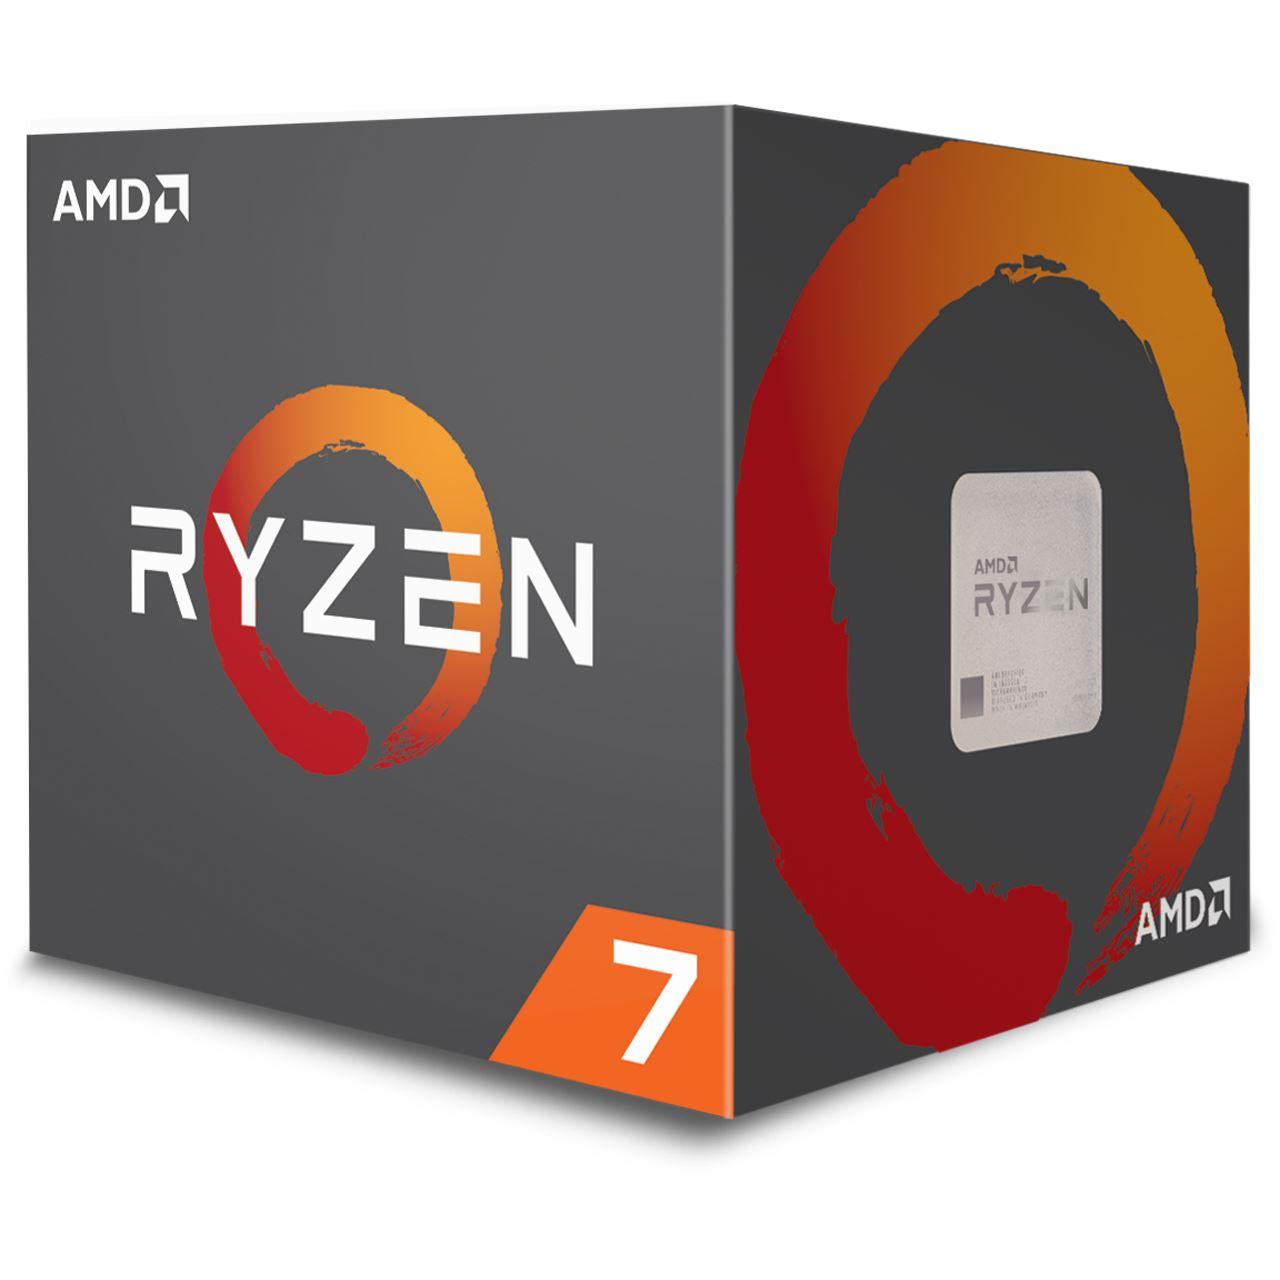 AMD RYZEN 1700 BOXED, 8 x 3,0 Ghz (Mindstar bei Mindfactory)